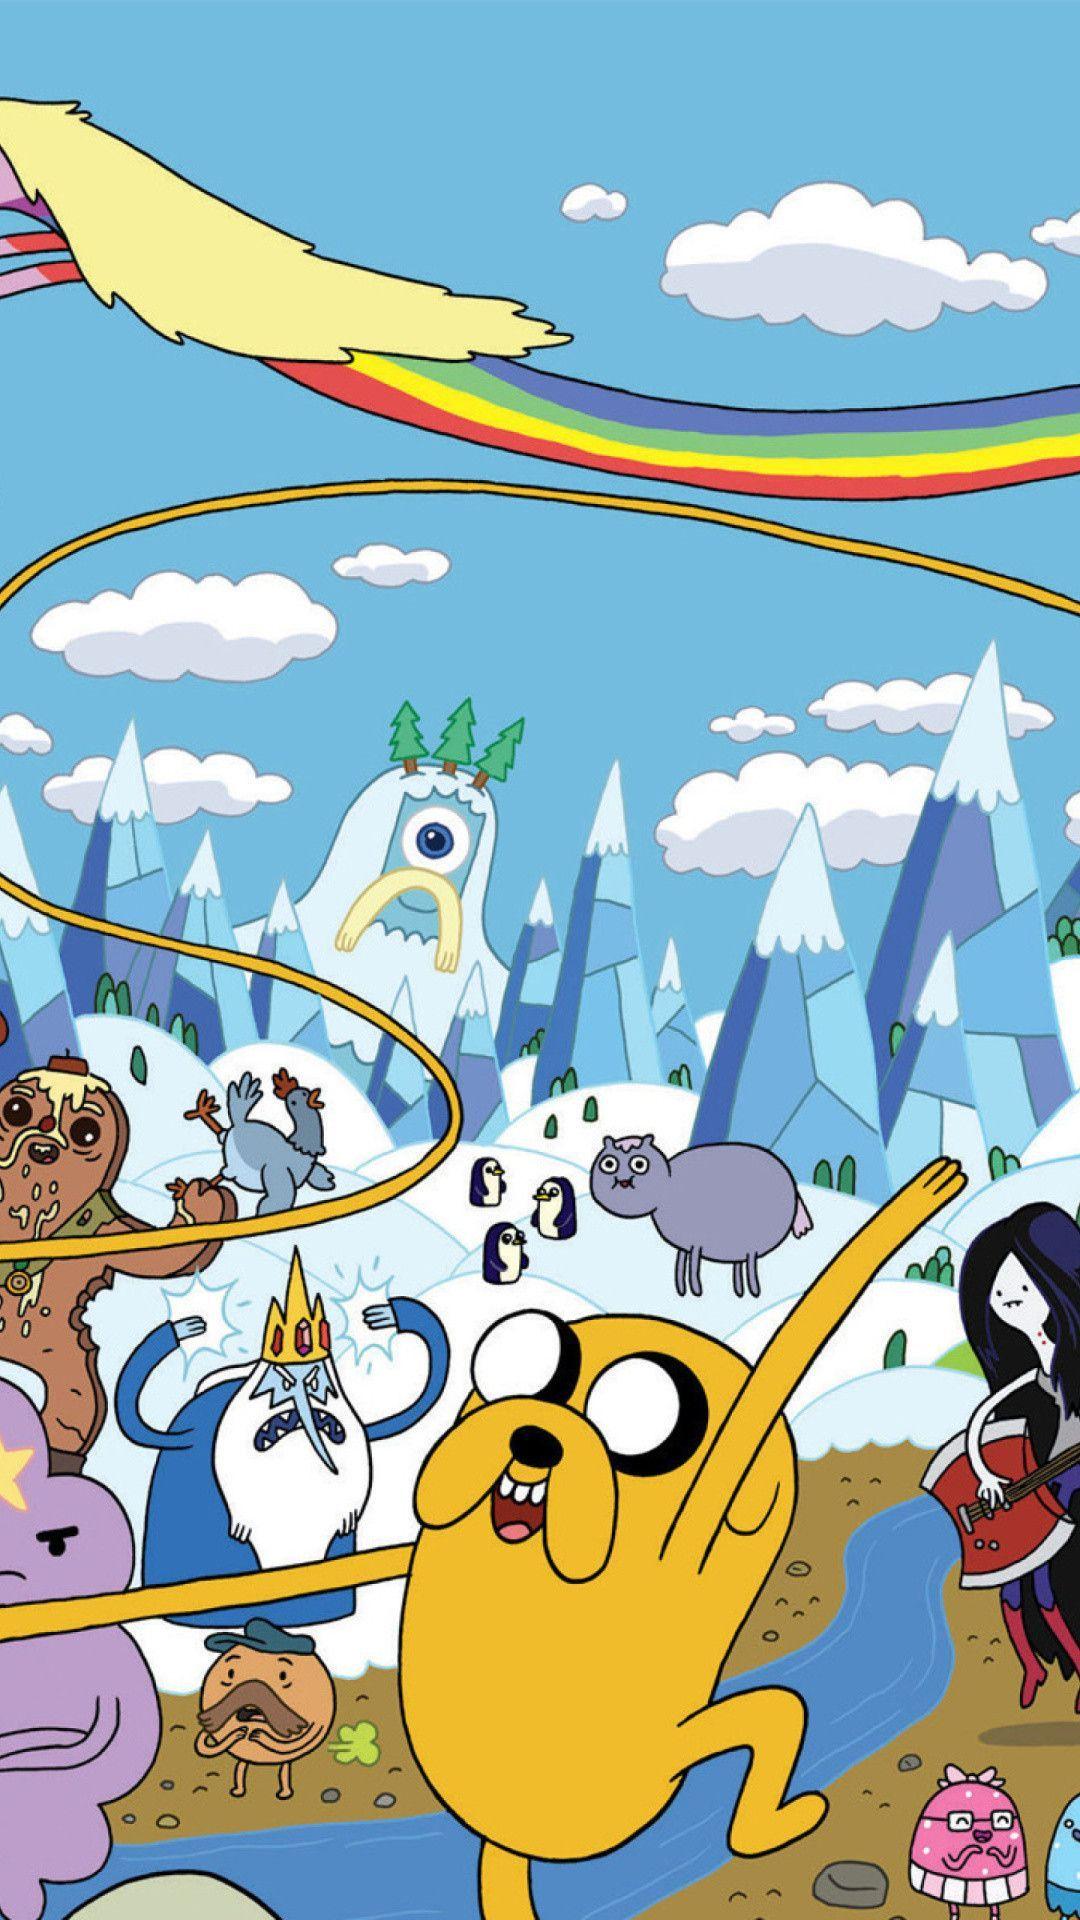 Aesthetic Adventure Time Wallpaper Download Adventure Time Wallpaper Adventure Time Iphone Wallpaper Iphone Cartoon